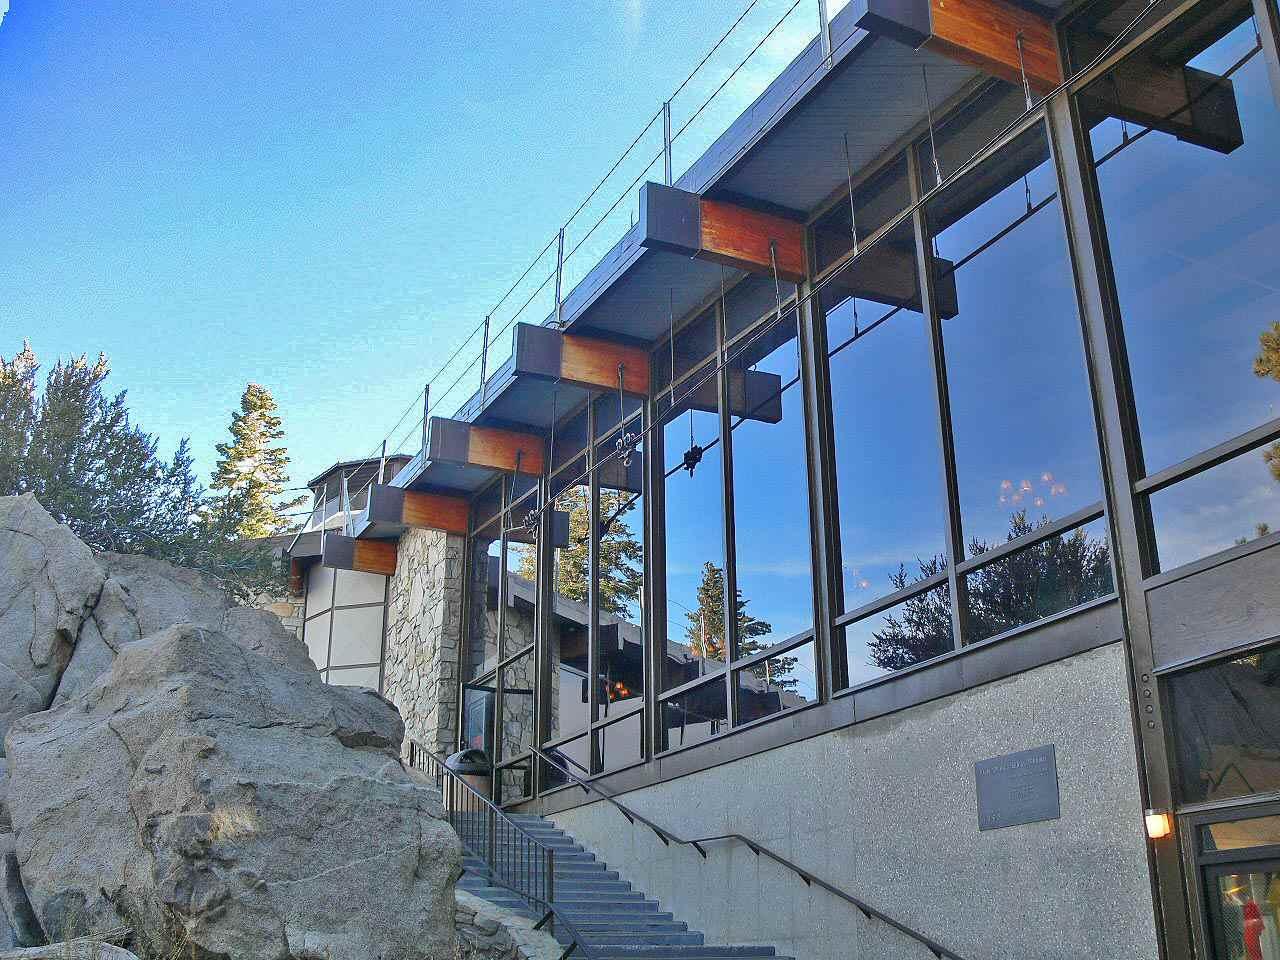 Palm Springs Aerial Tramway Alpine Station